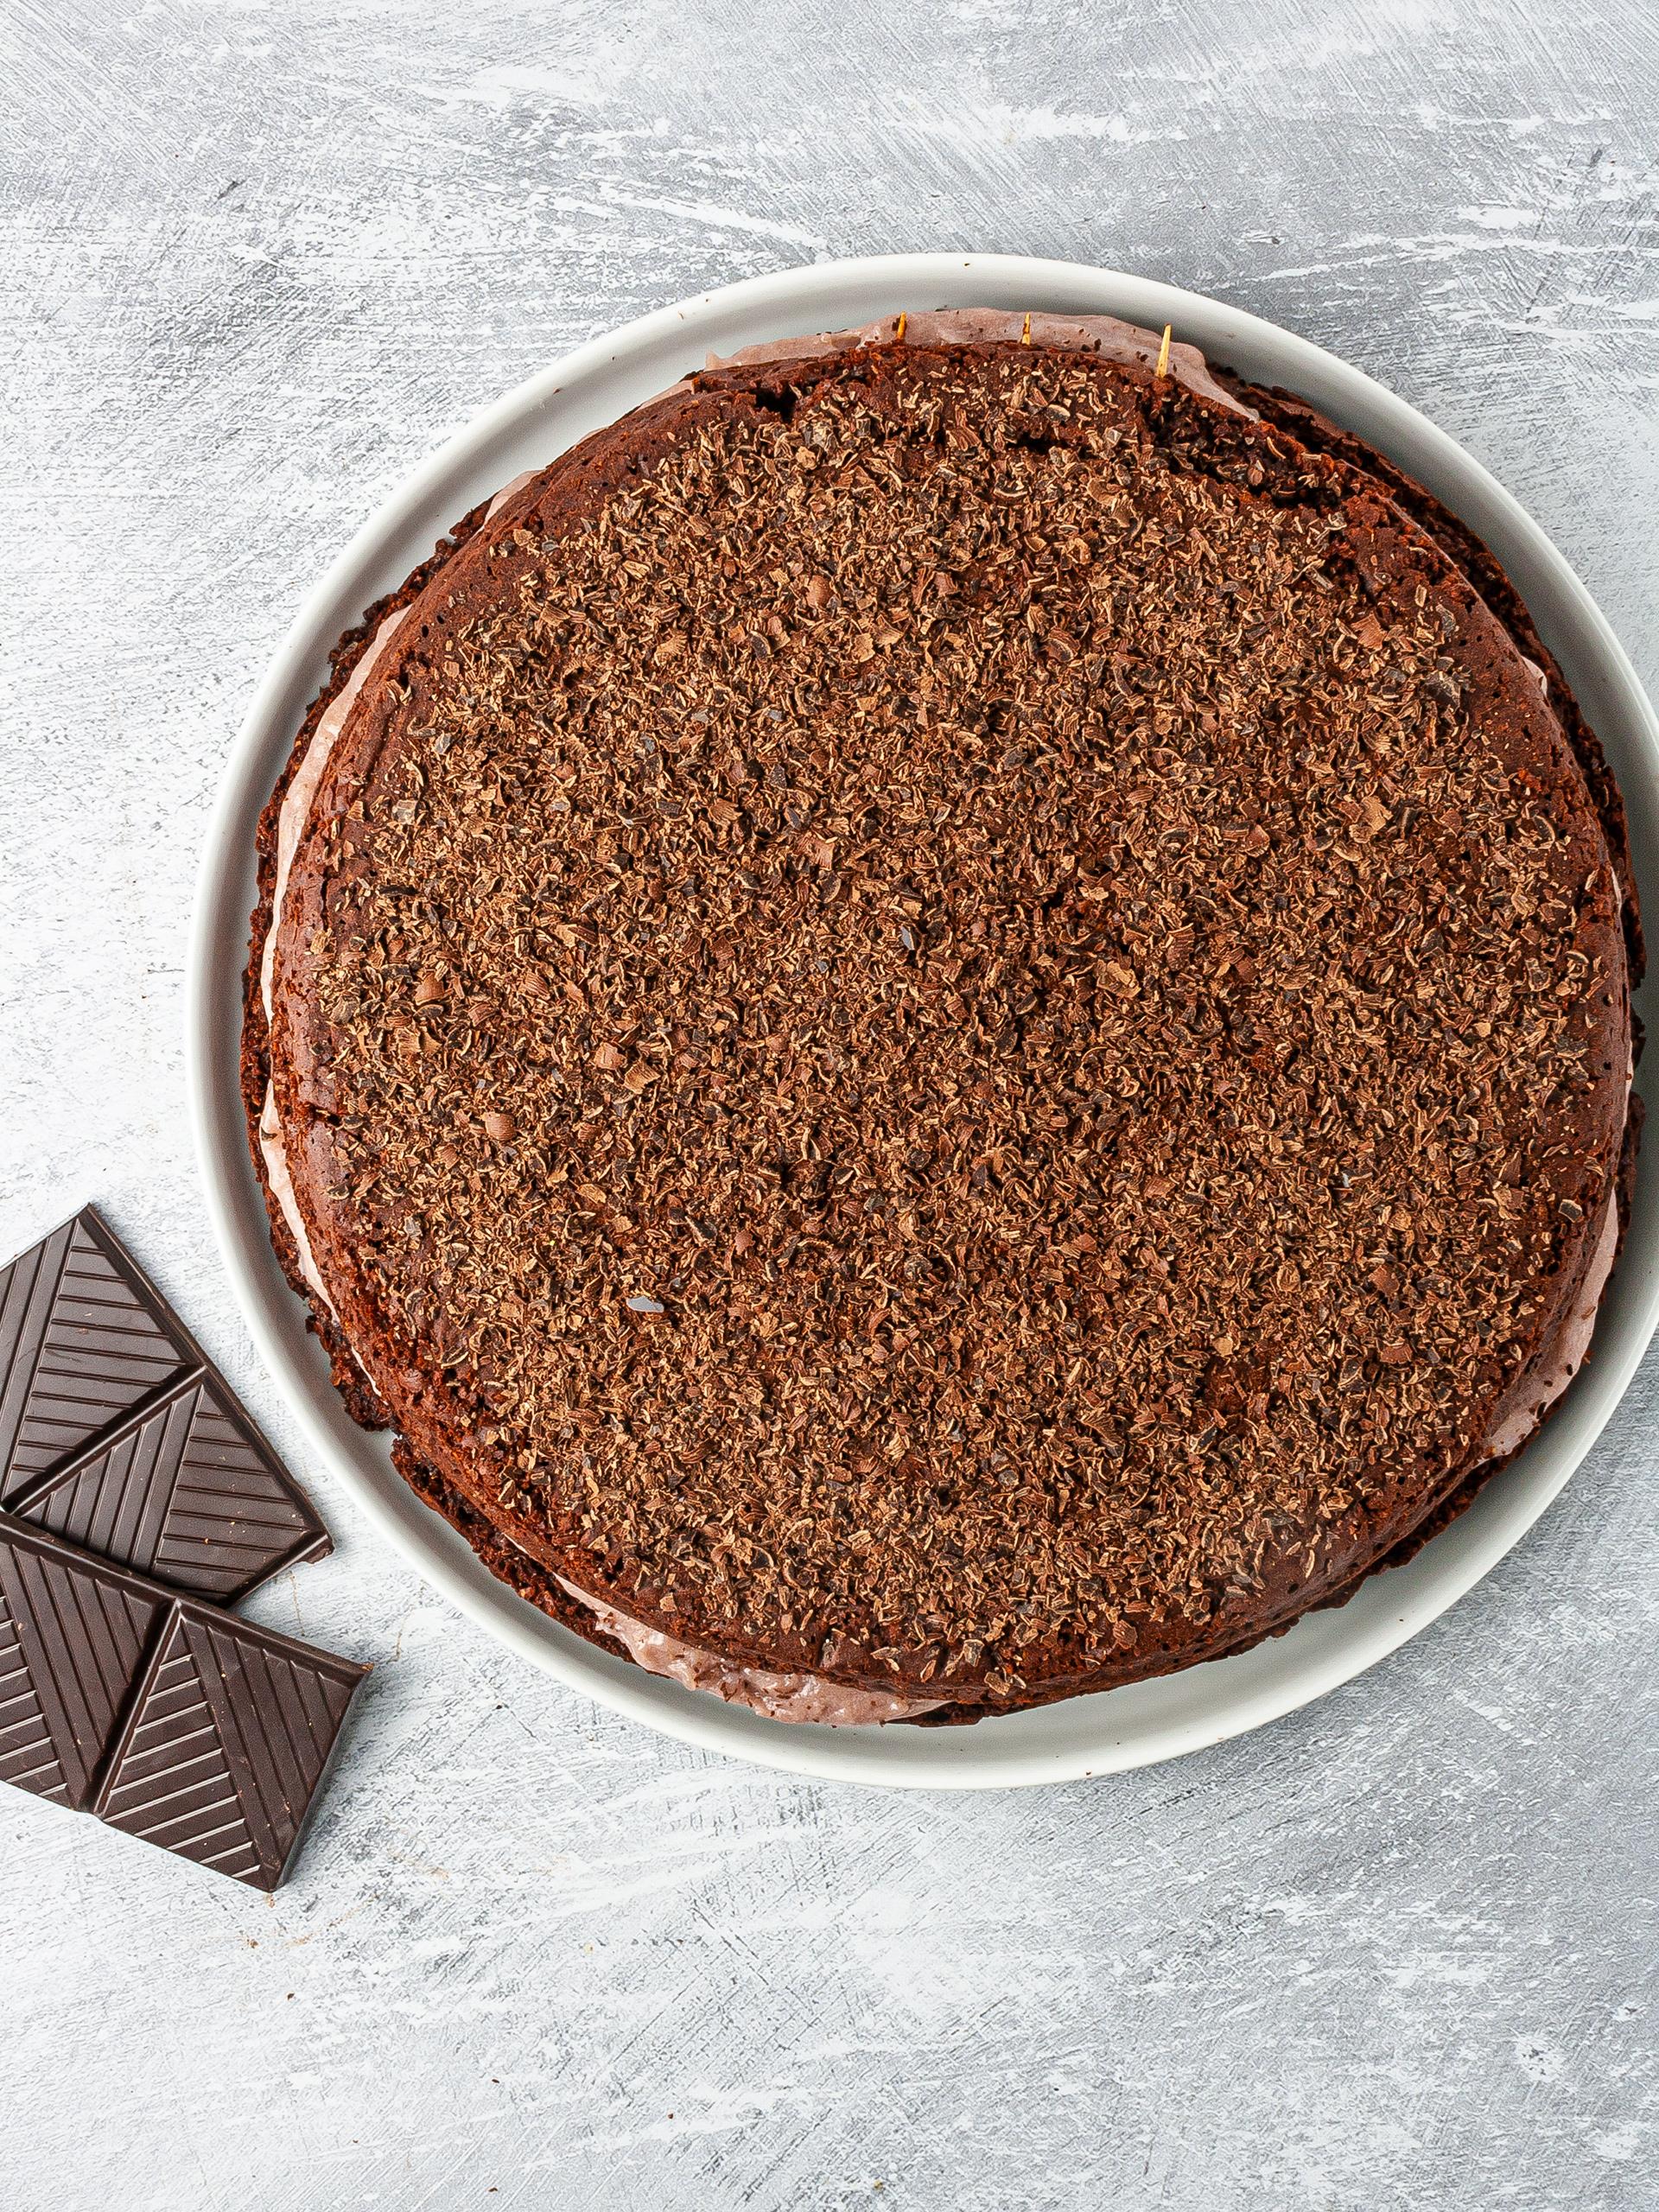 Step 5.2 of Chocolate Lavender Cake Recipe